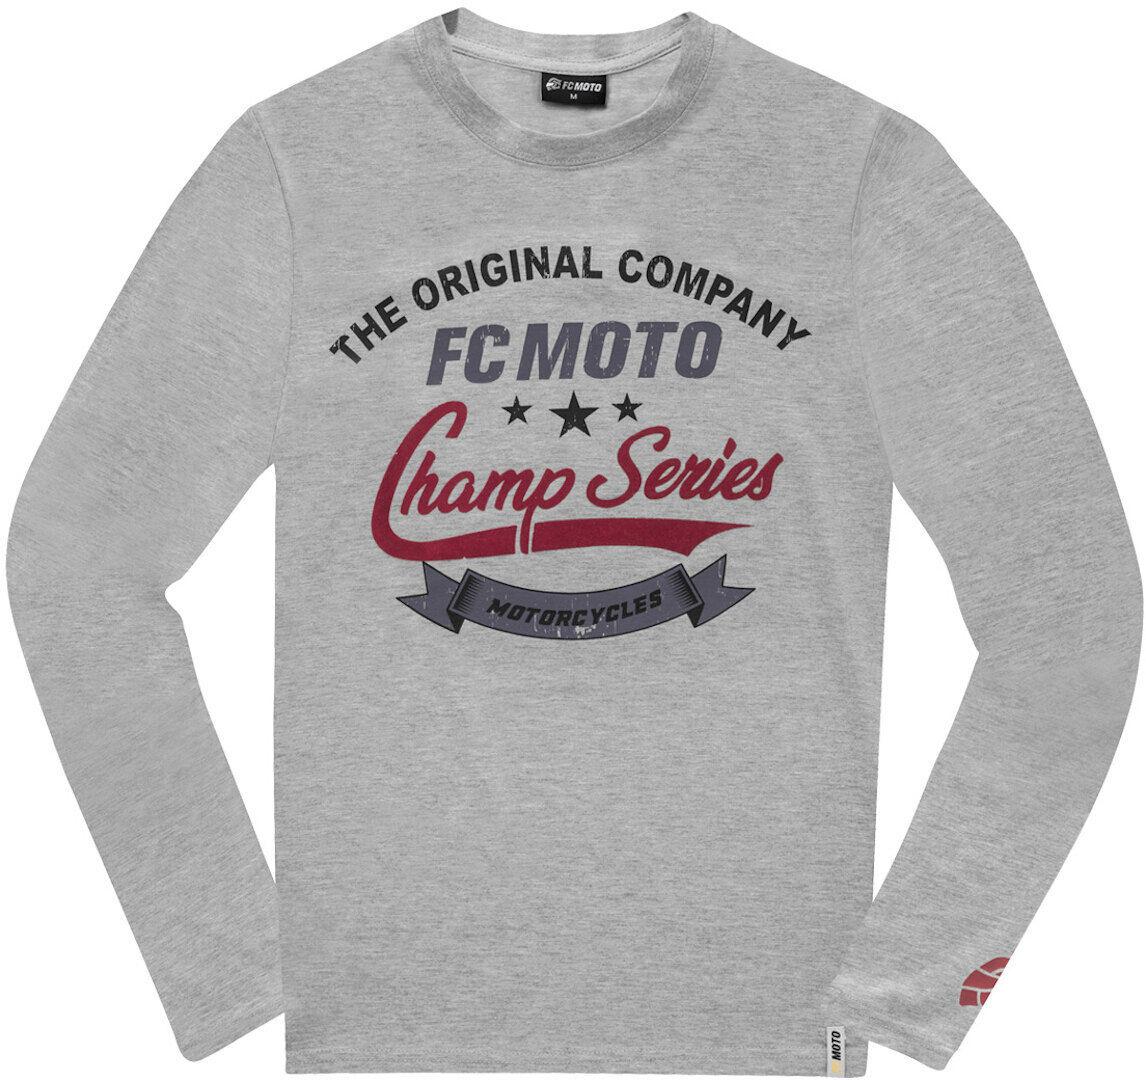 FC-Moto Champ Series Camicia Longsleeve